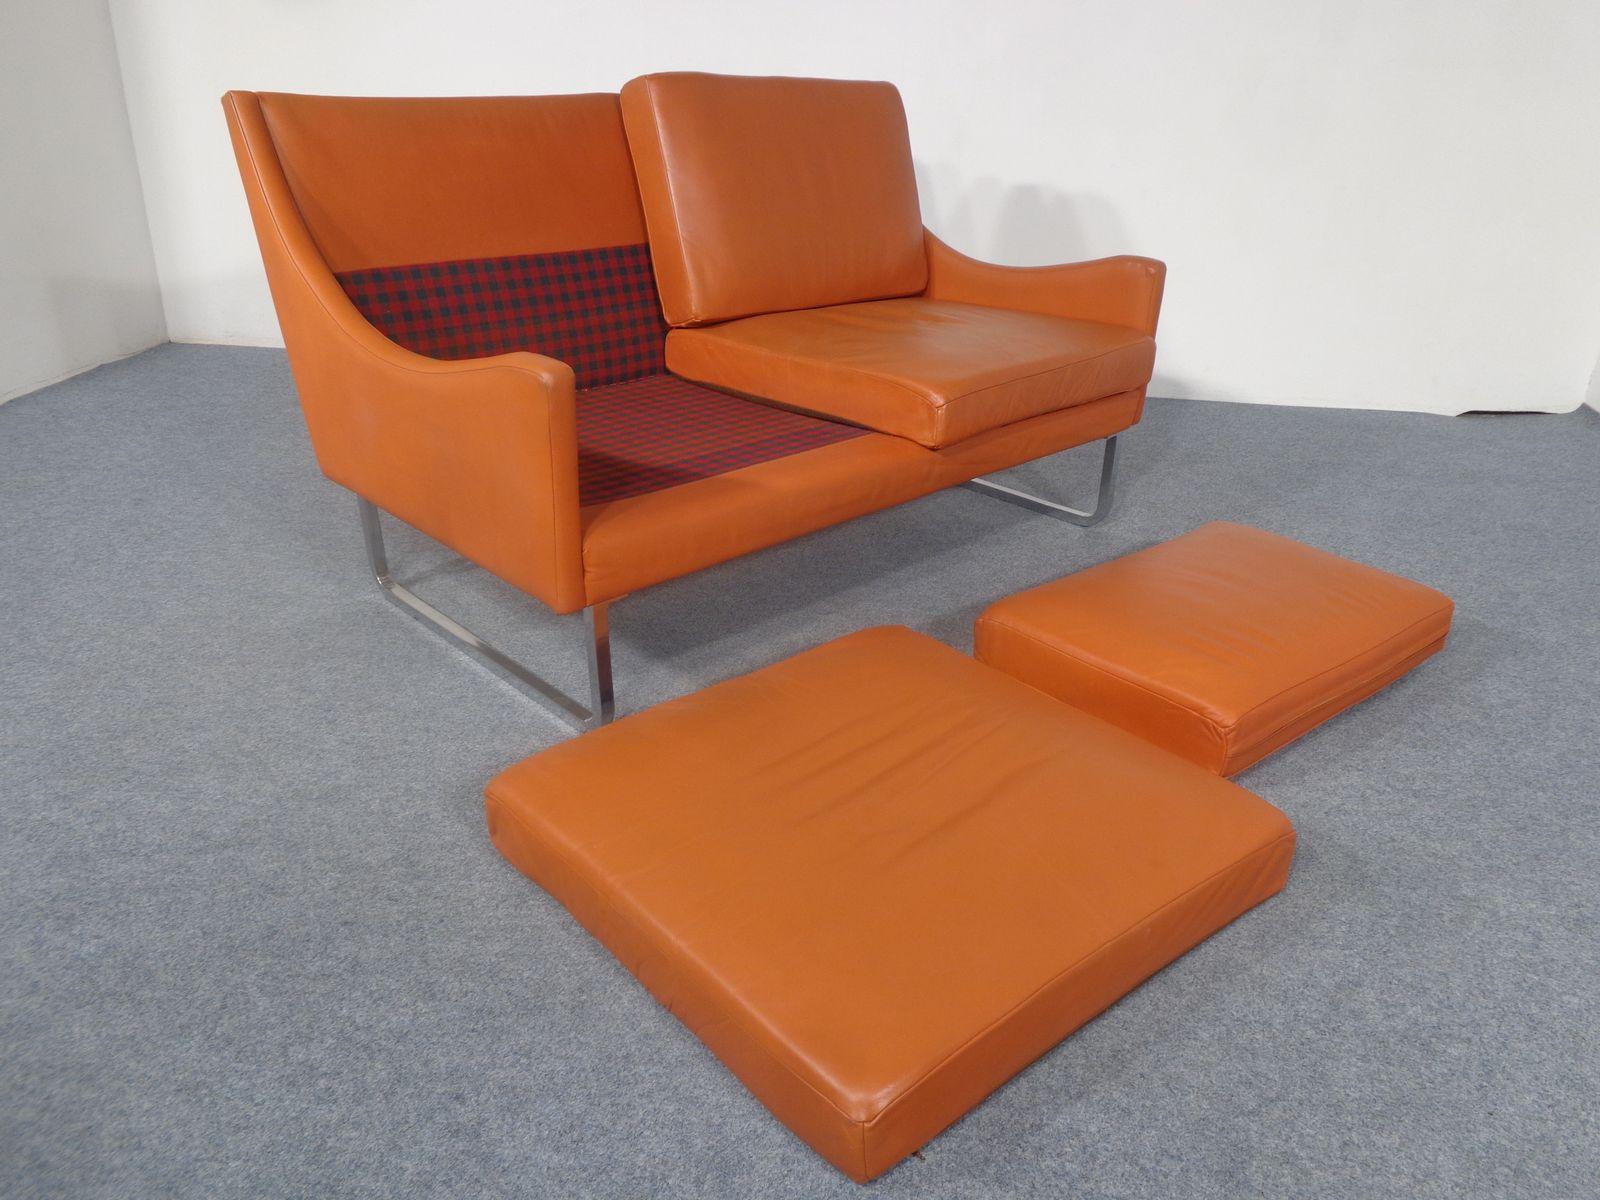 ledersofa auf kufen 1970er bei pamono kaufen. Black Bedroom Furniture Sets. Home Design Ideas